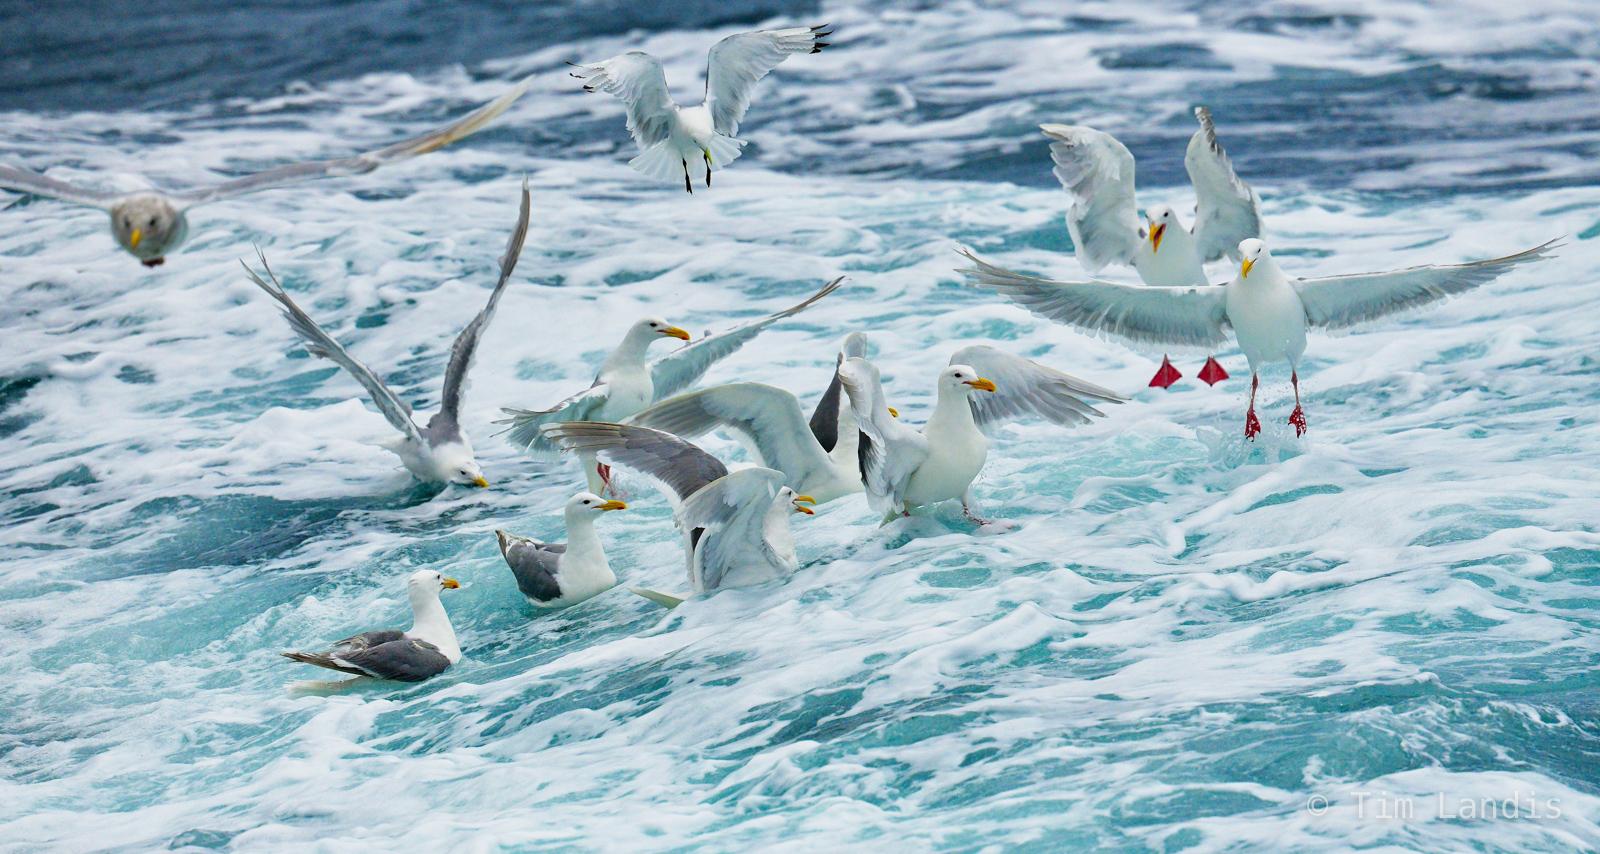 Kittiwake, bubbles, sea gulls feeding, splash, photo